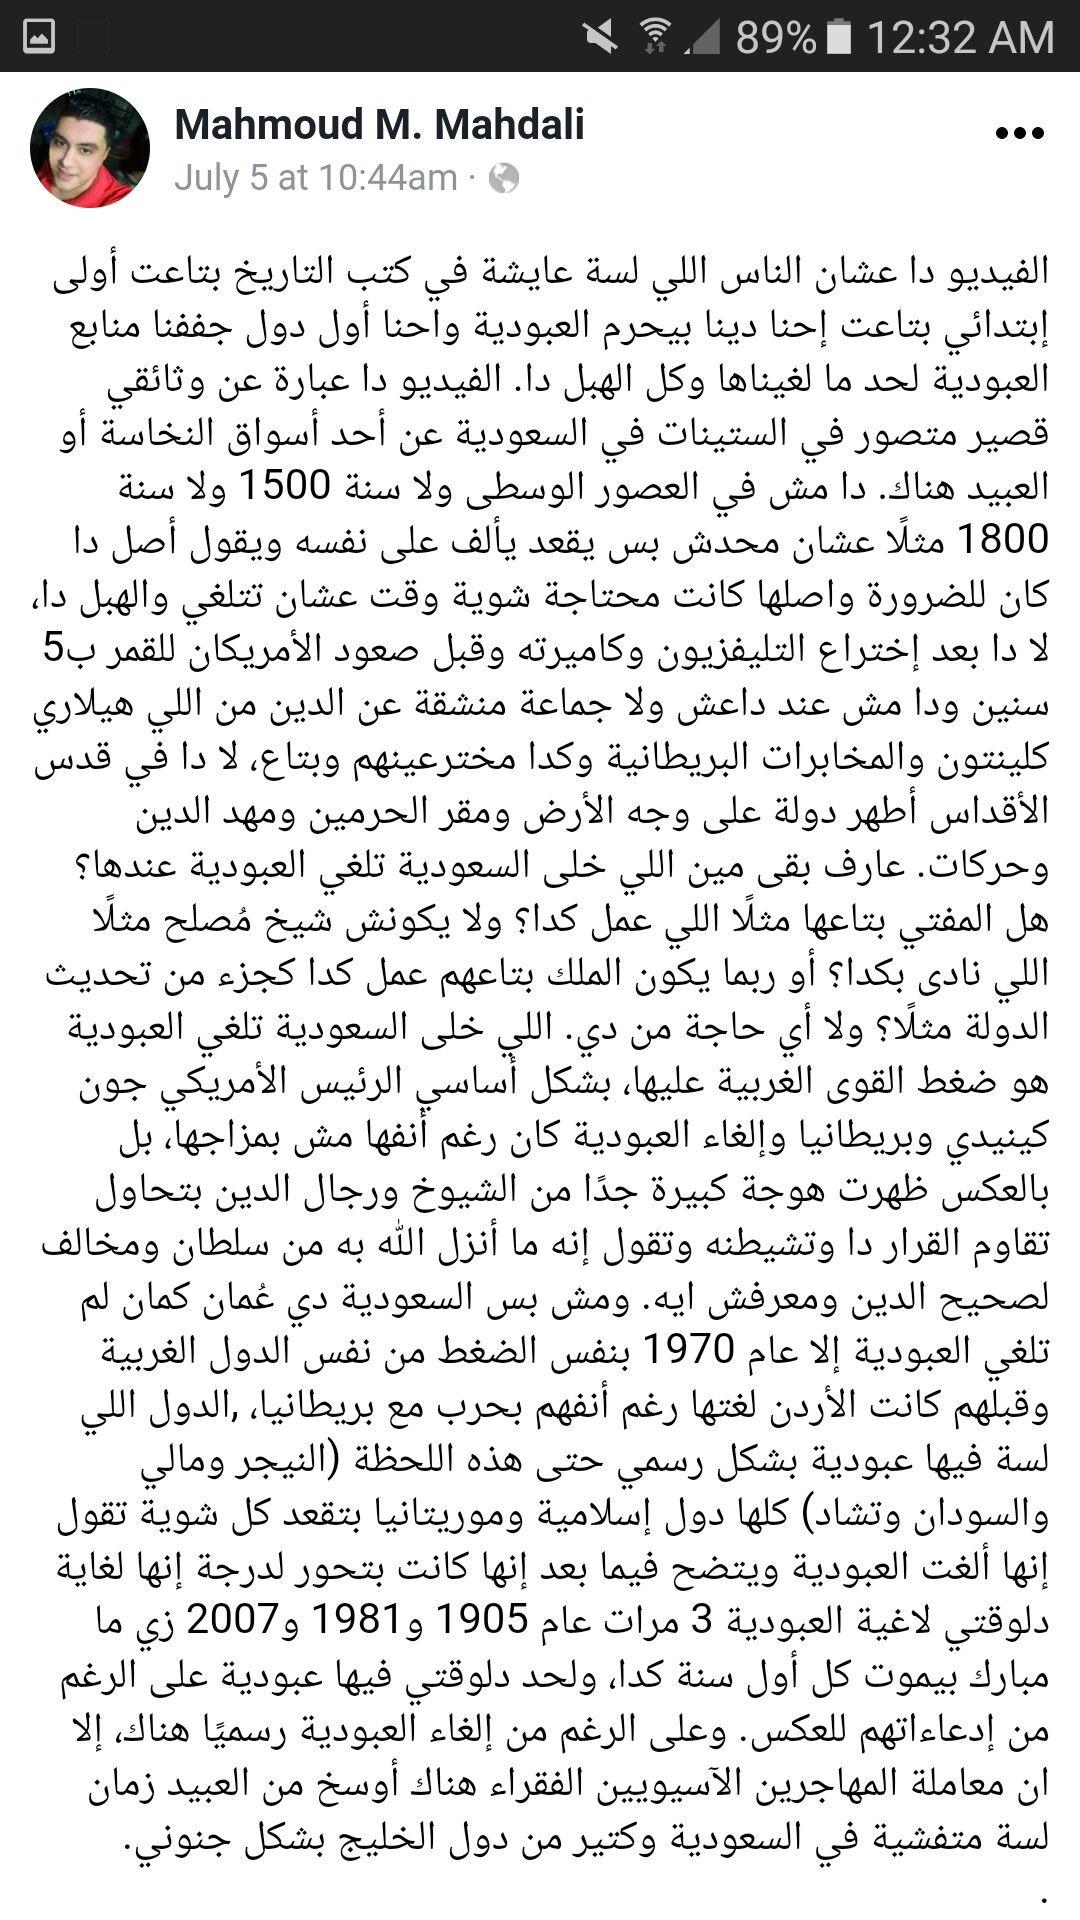 الاسلام و العبوديه | Short articles  | Cool words, Words, Short article